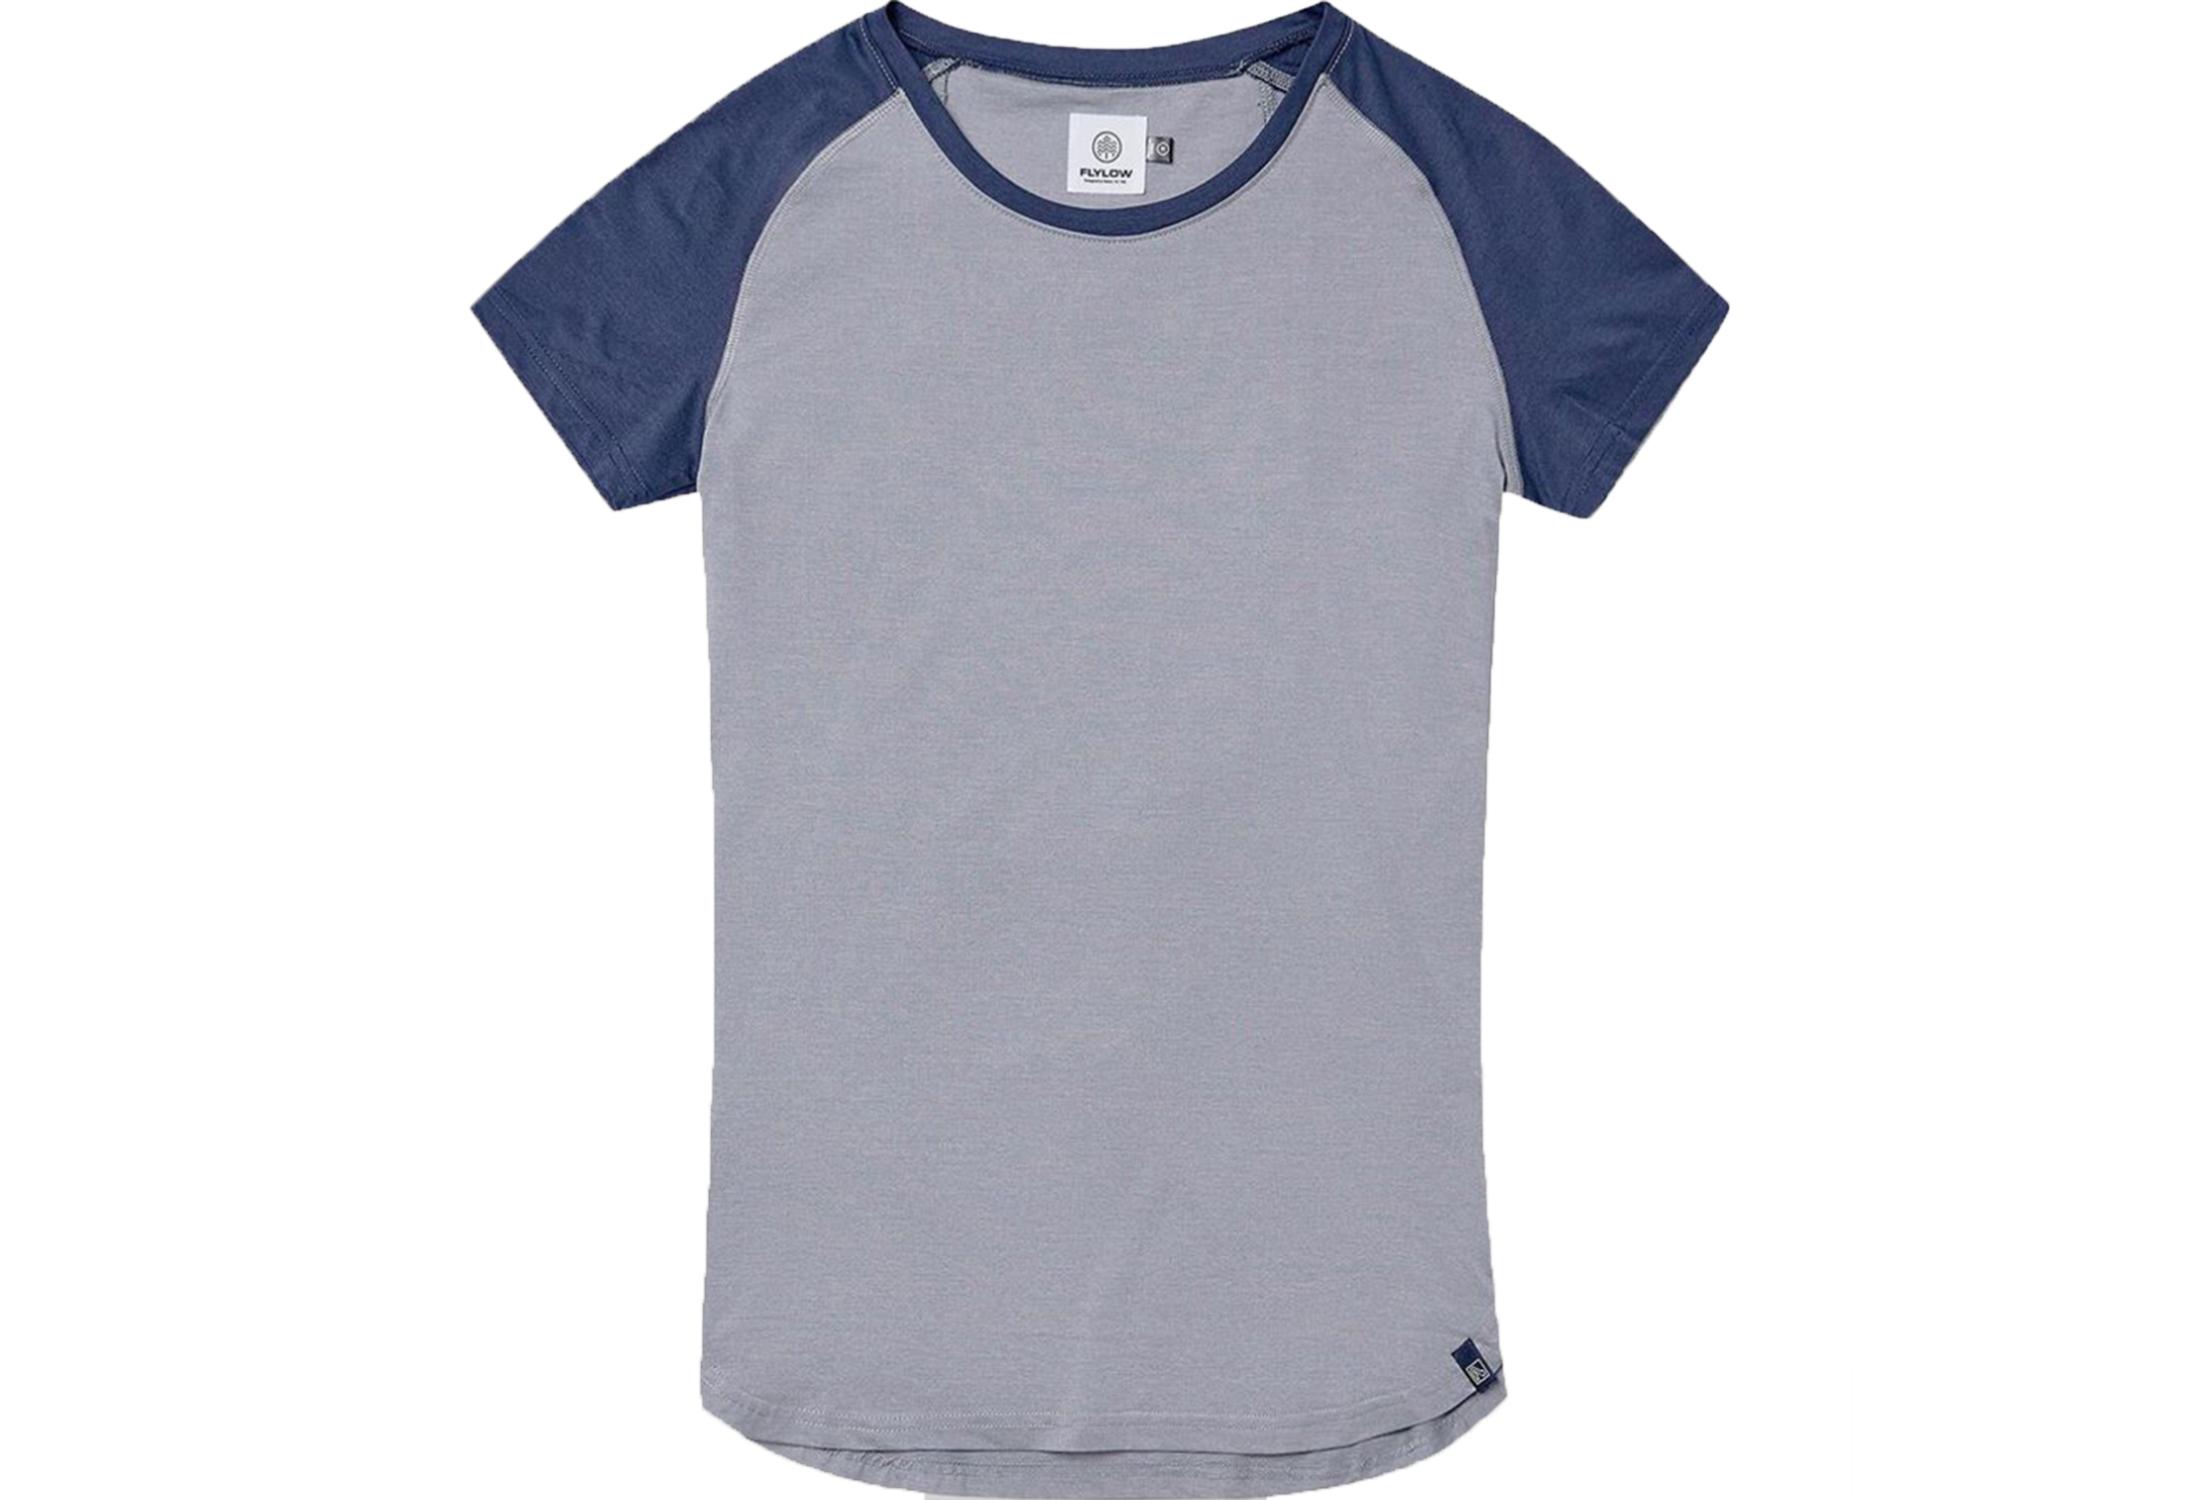 flylow jessi running shirt